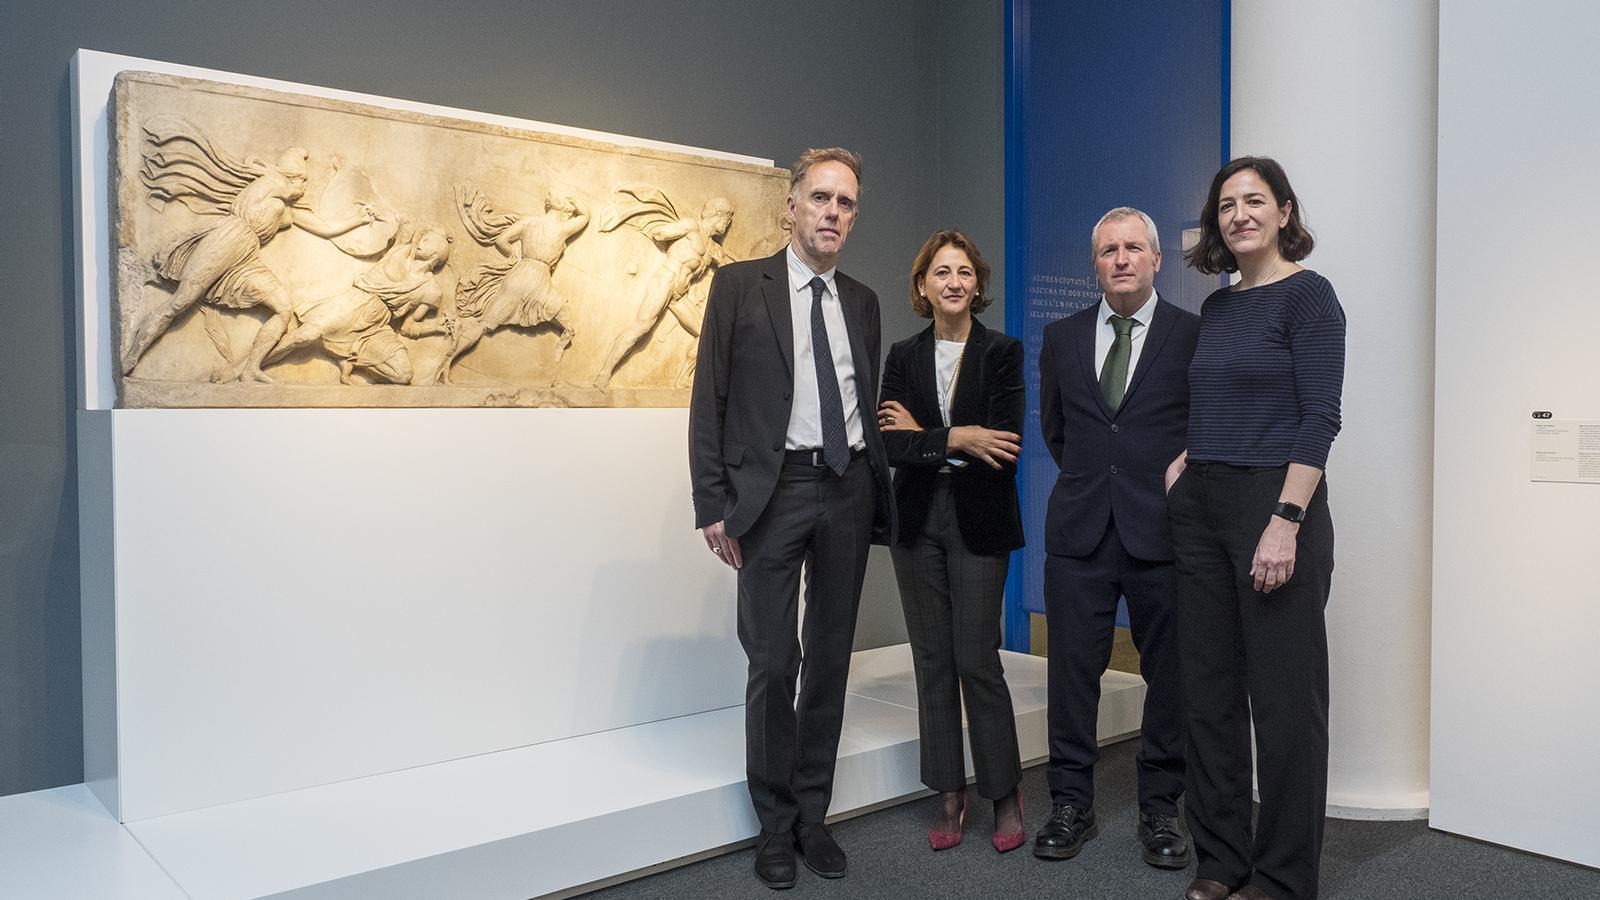 Philip Attwood, Margarita Pérez Villegas, Peter Higgs i Isabel Salgado